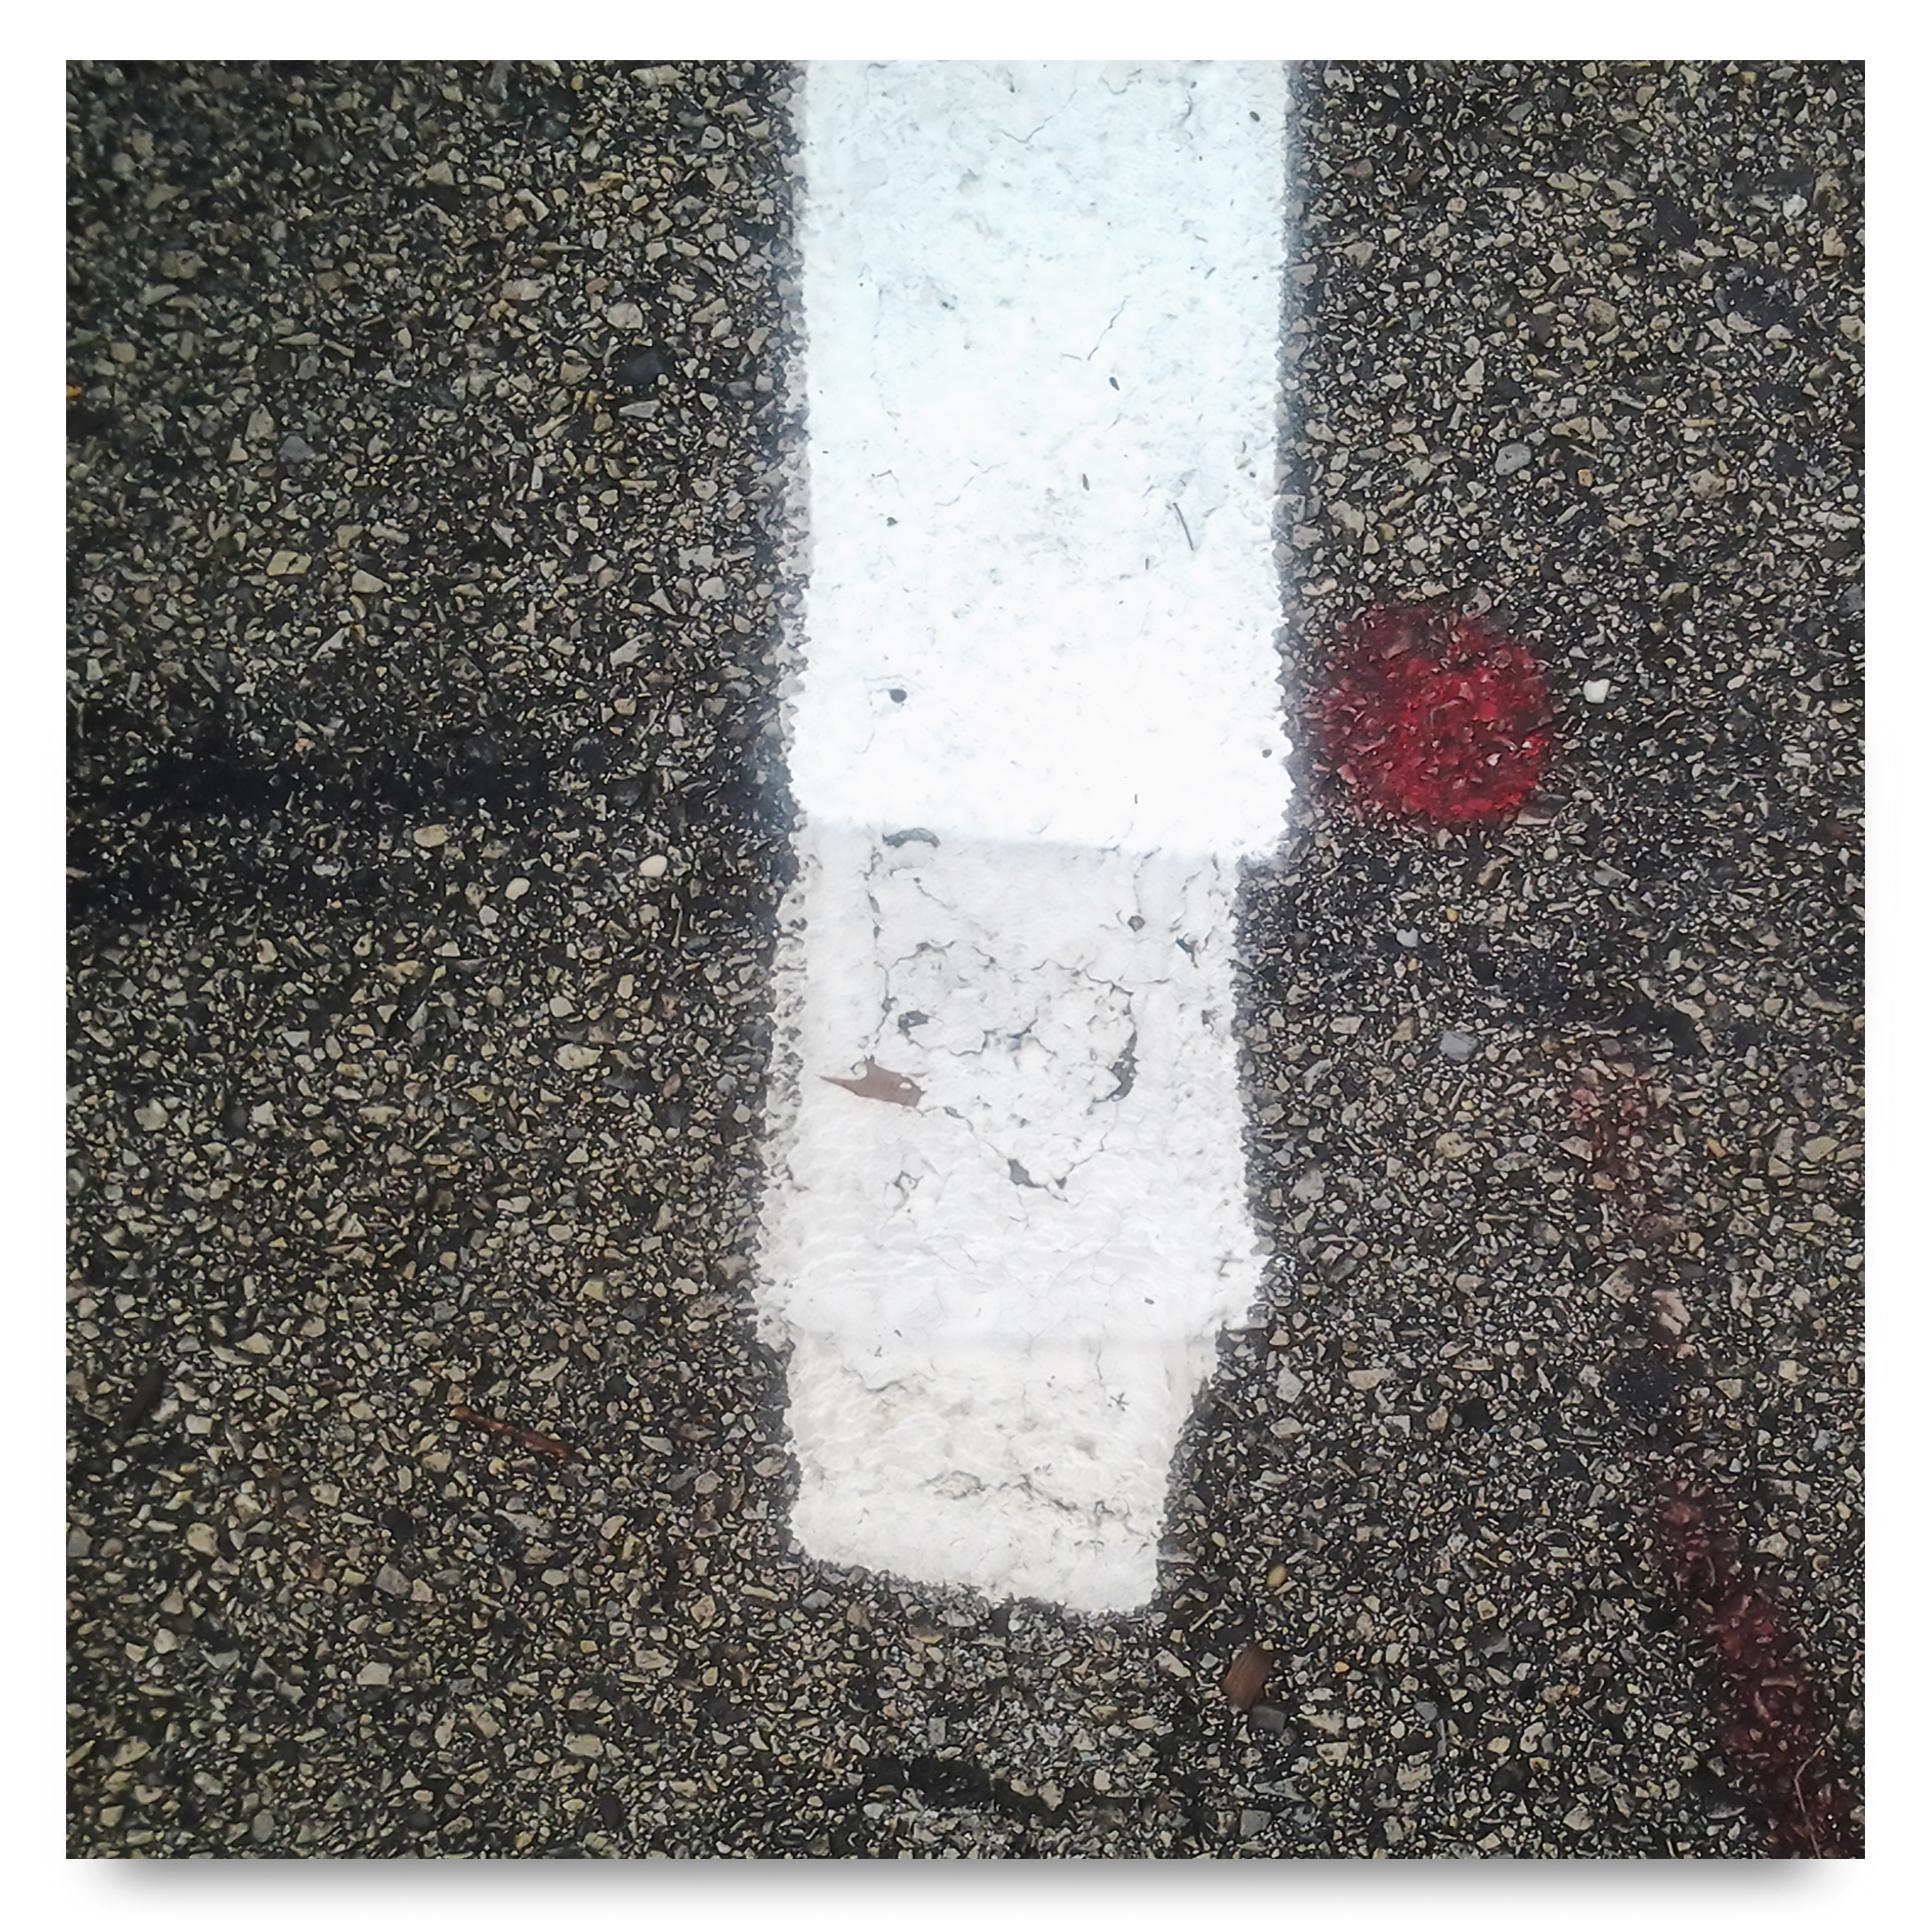 Road Rage#02, 2010